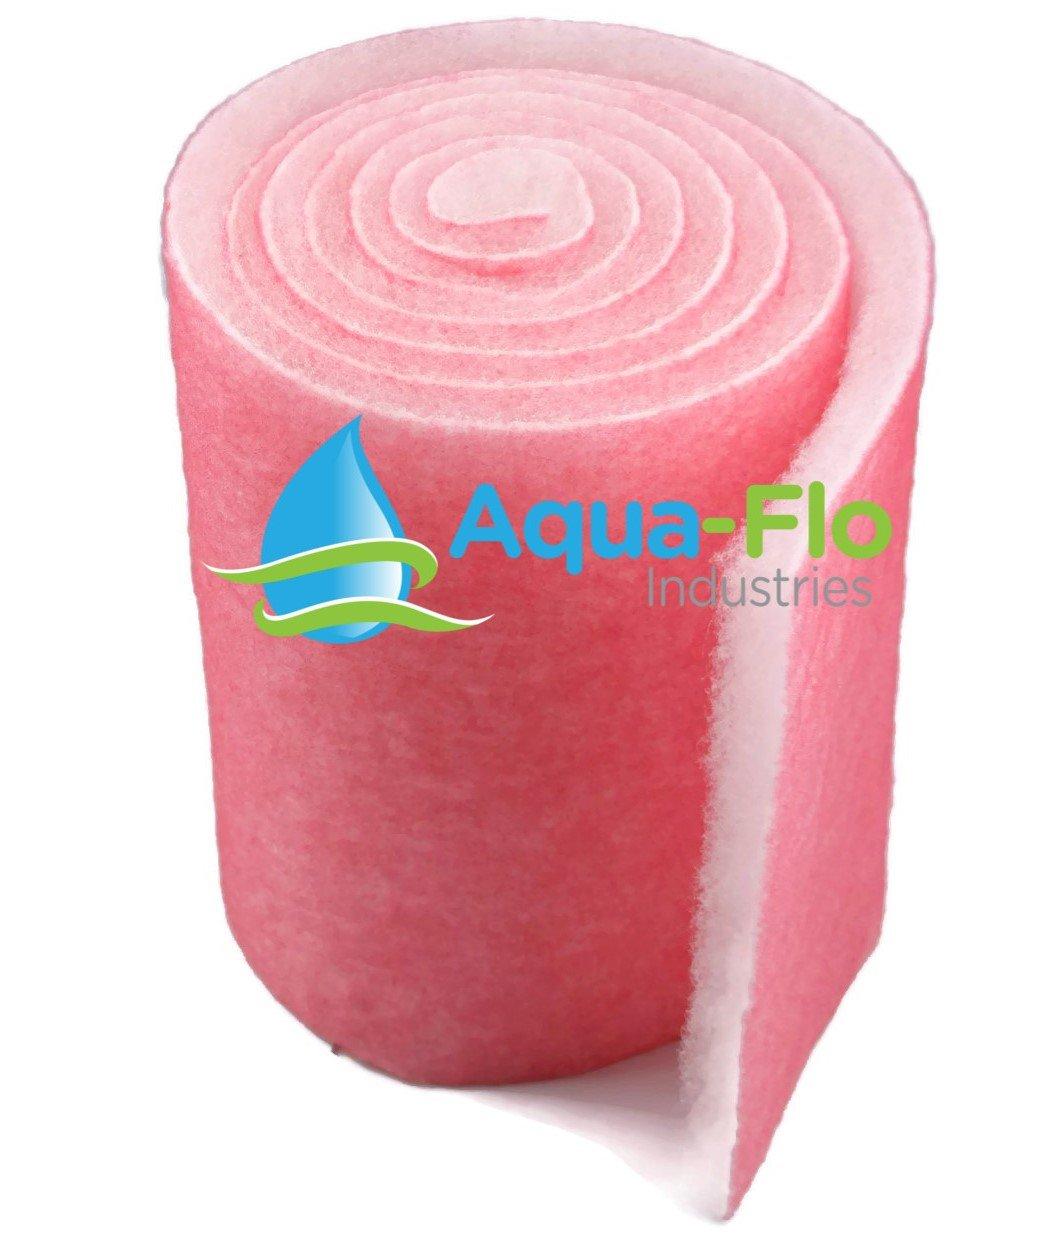 "Aqua-Flo Pond & Aquarium Filter Media, 12"" x 120"" (10 Feet) Long x 1"" Thick (Pink/White)"